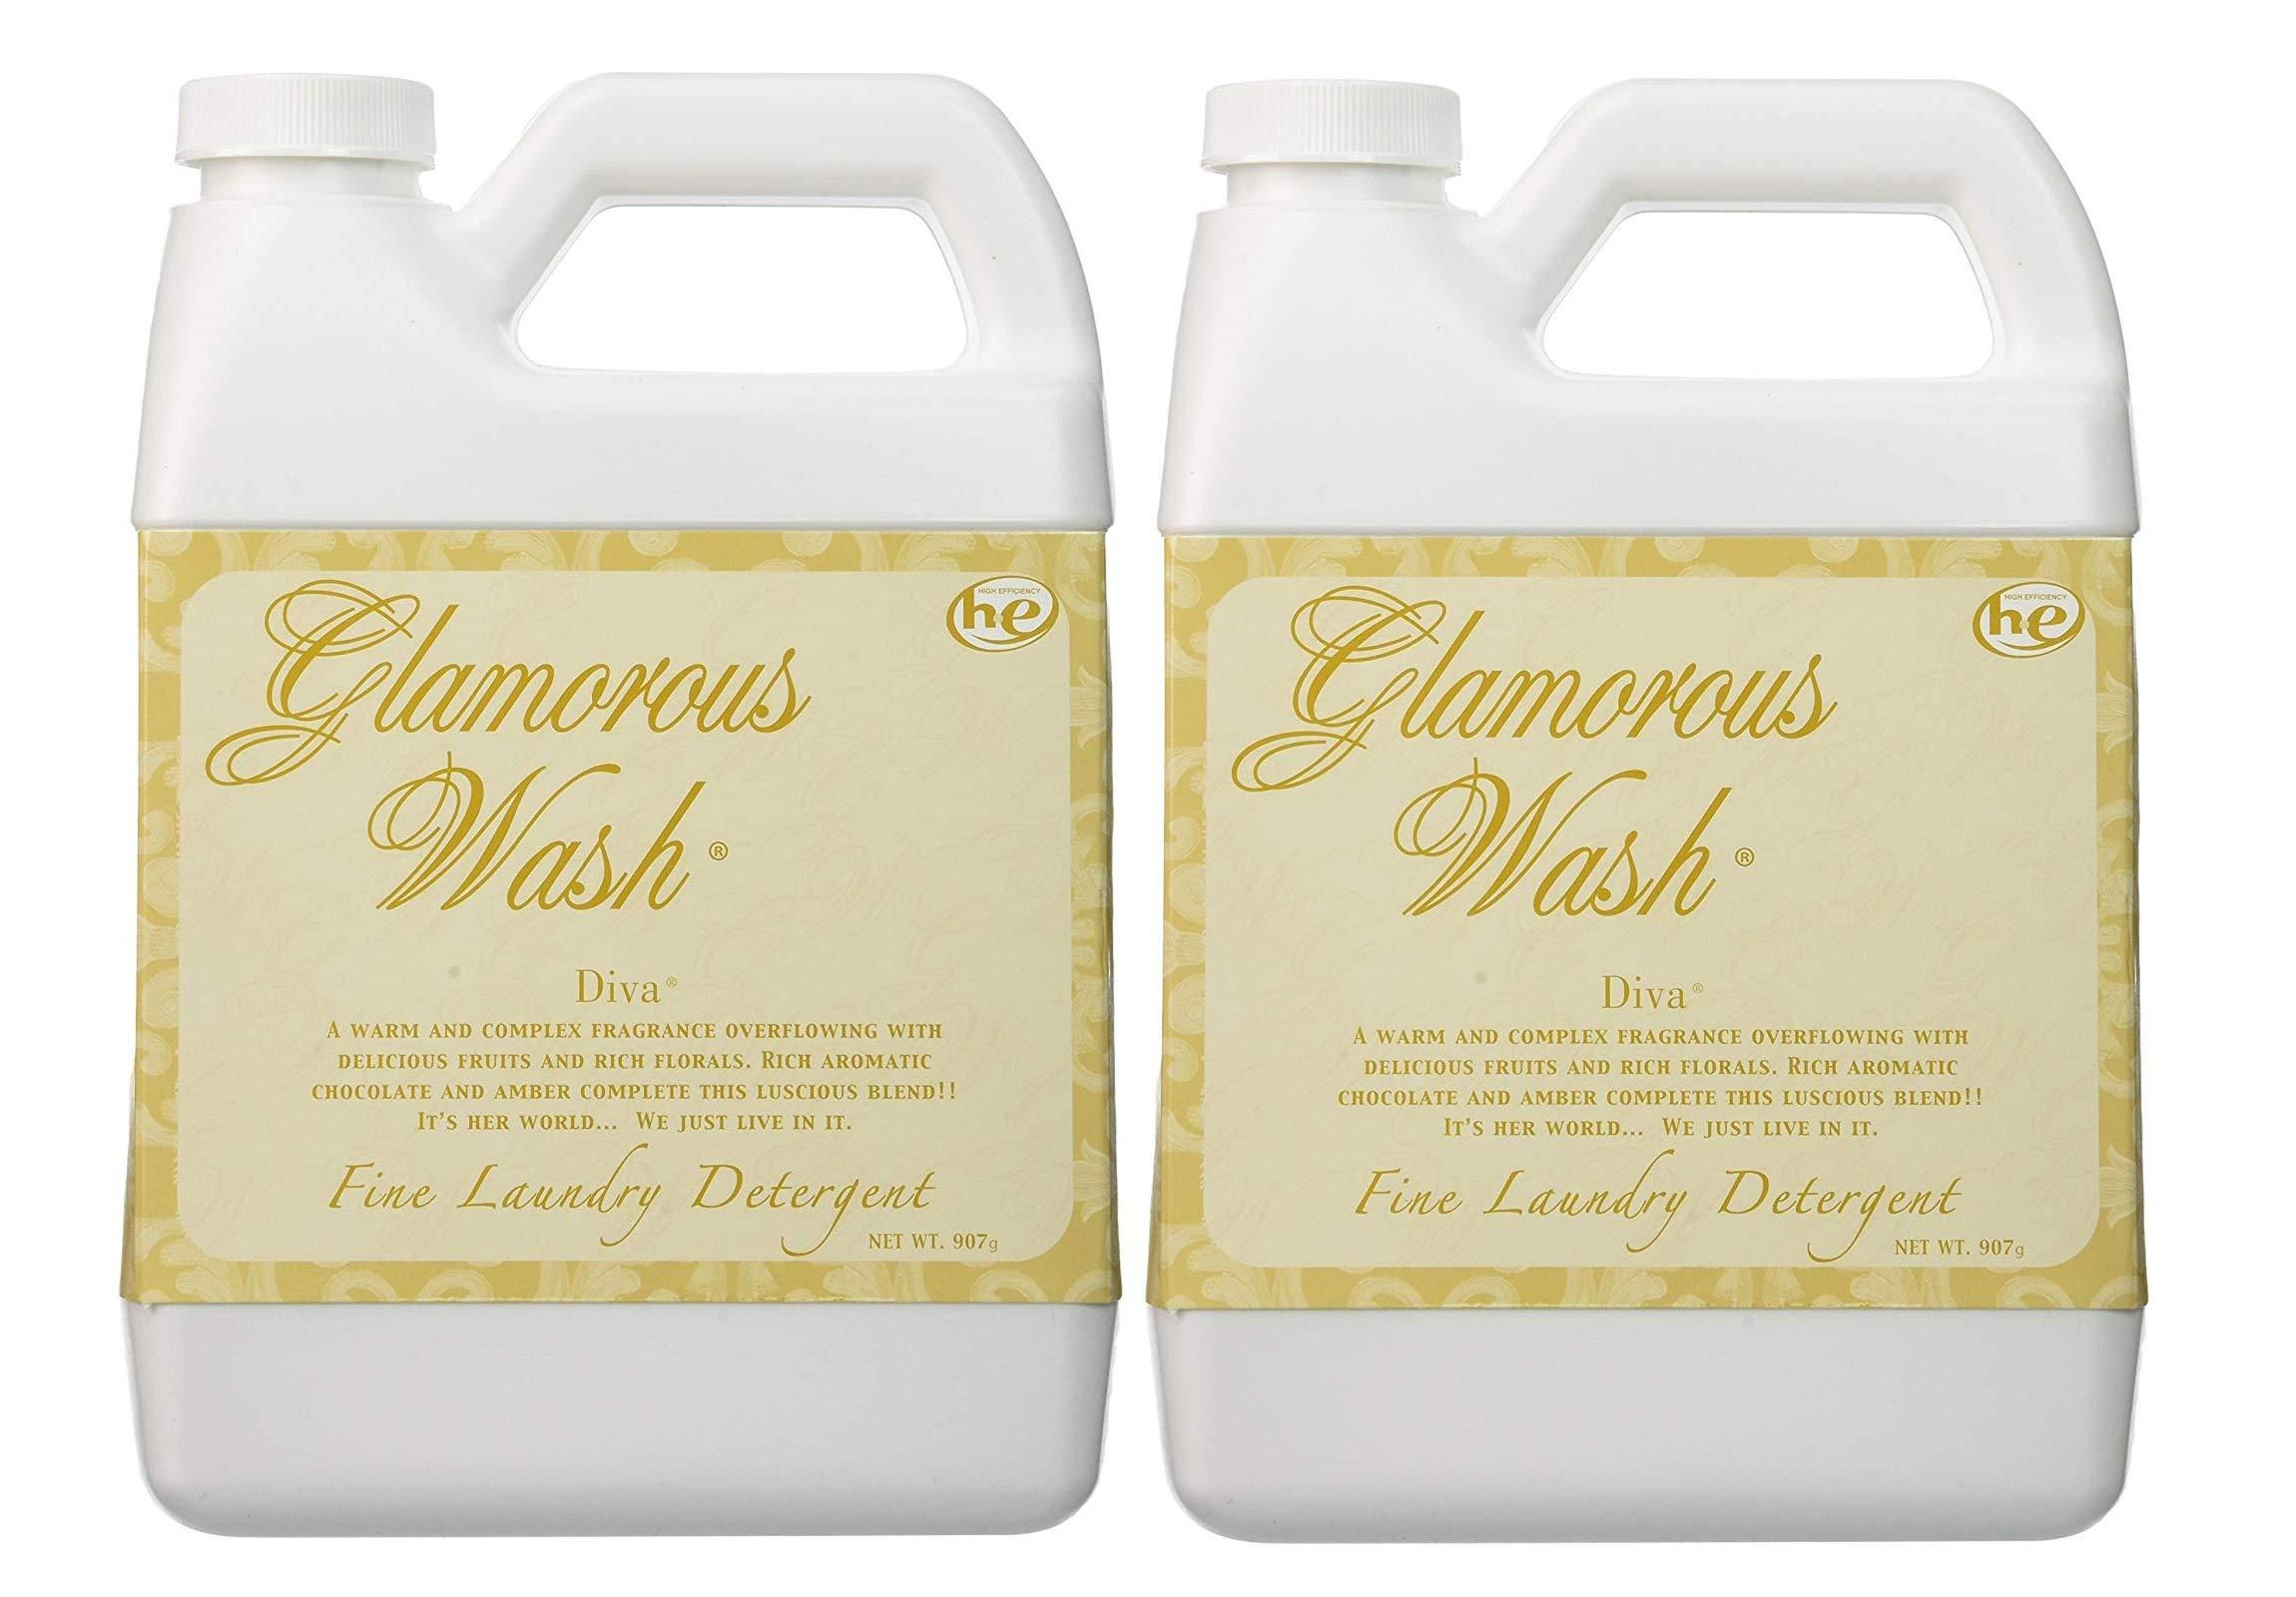 Tyler Glamorous Wash Diva Fine Laundry Detergent 3.78 Liters (2 Pack)